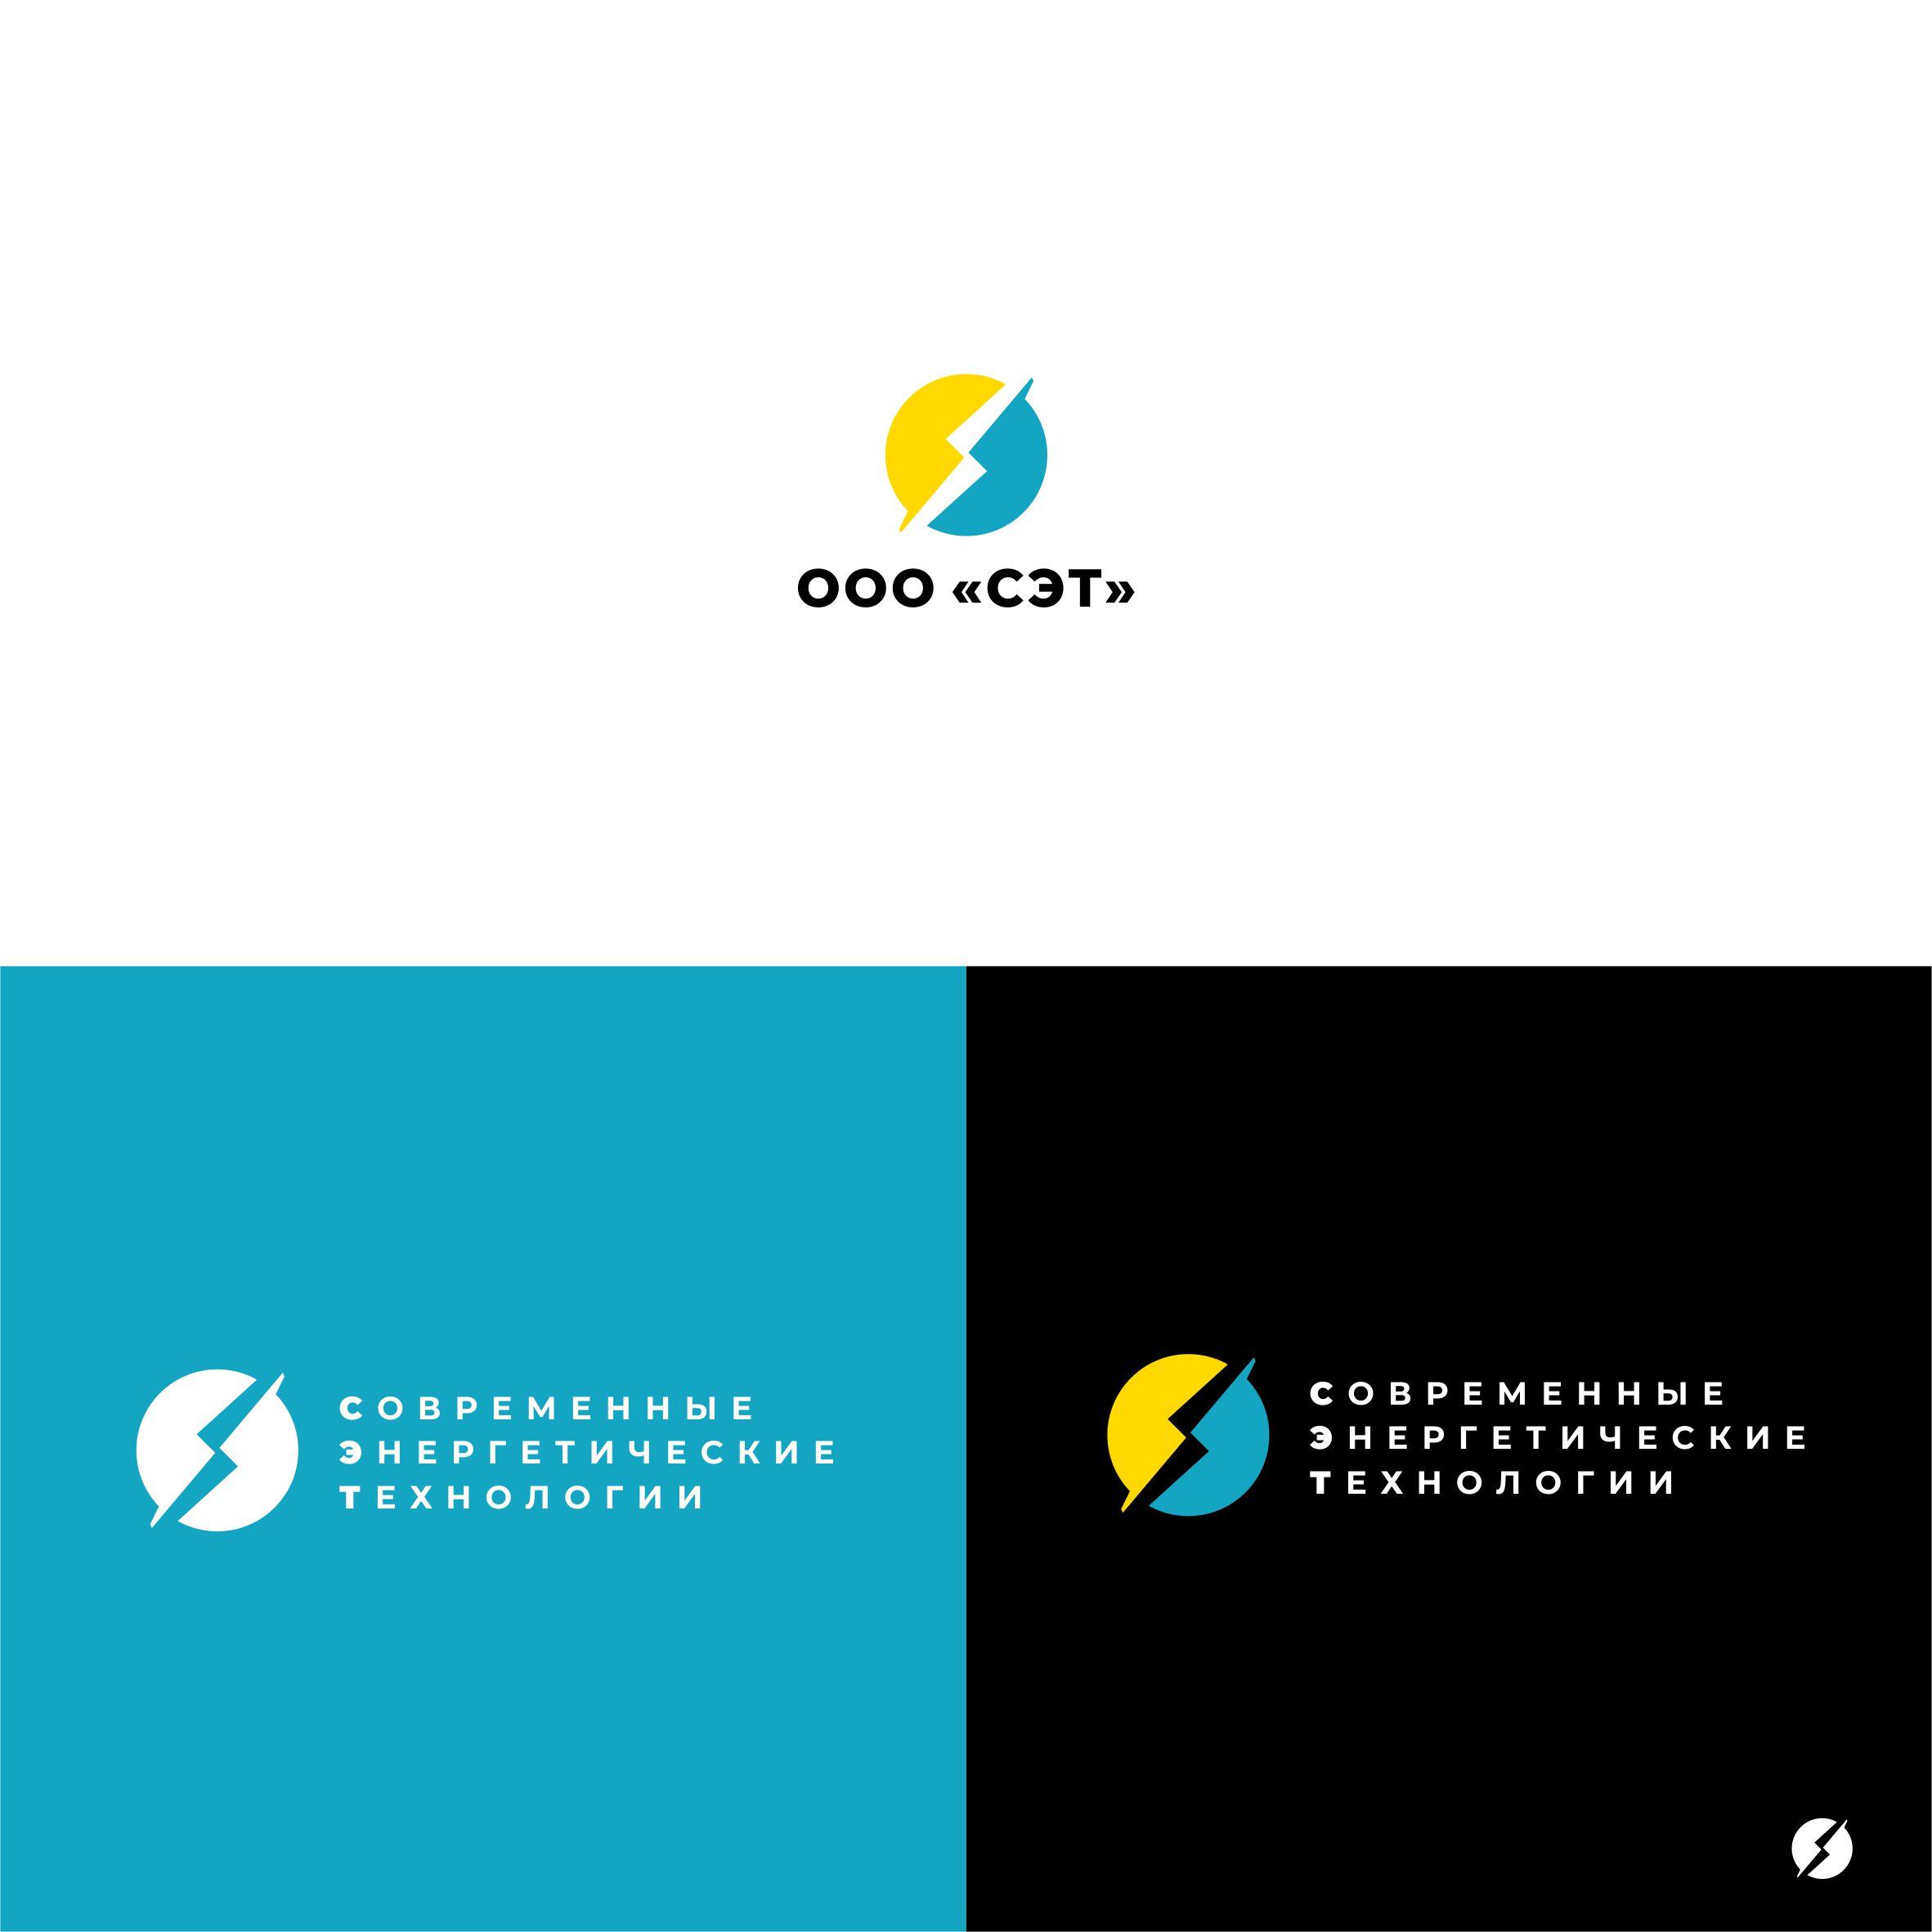 Срочно! Дизайн логотипа ООО «СЭТ» фото f_3635d4b399181191.jpg